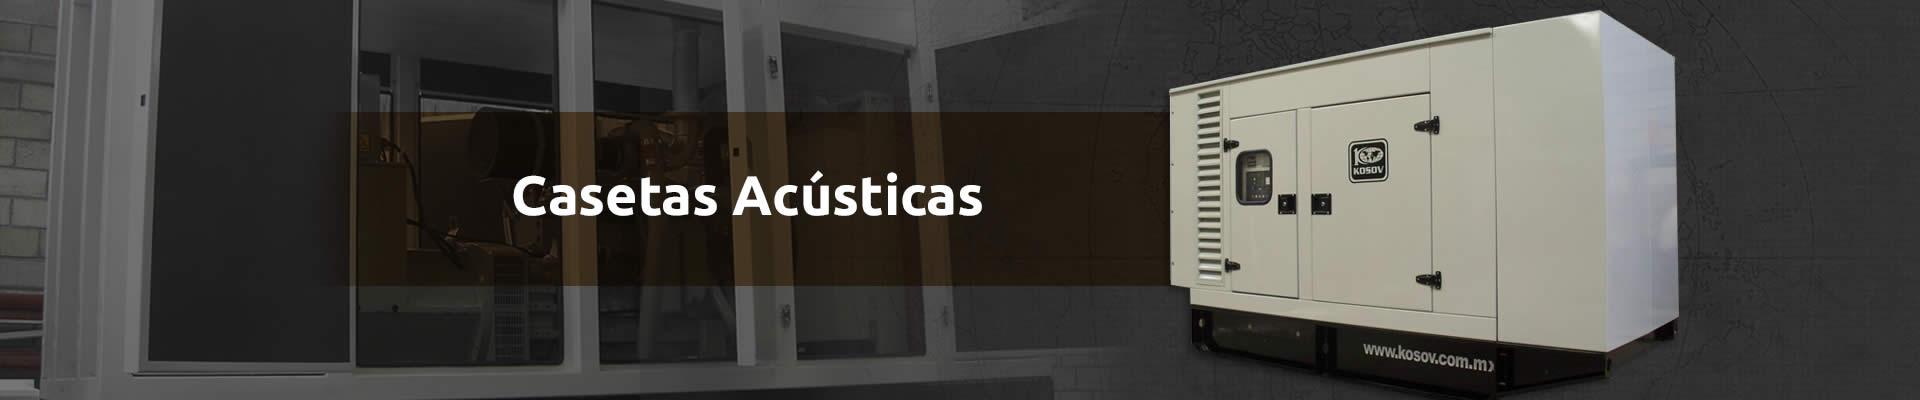 banner_casetas_acusticas